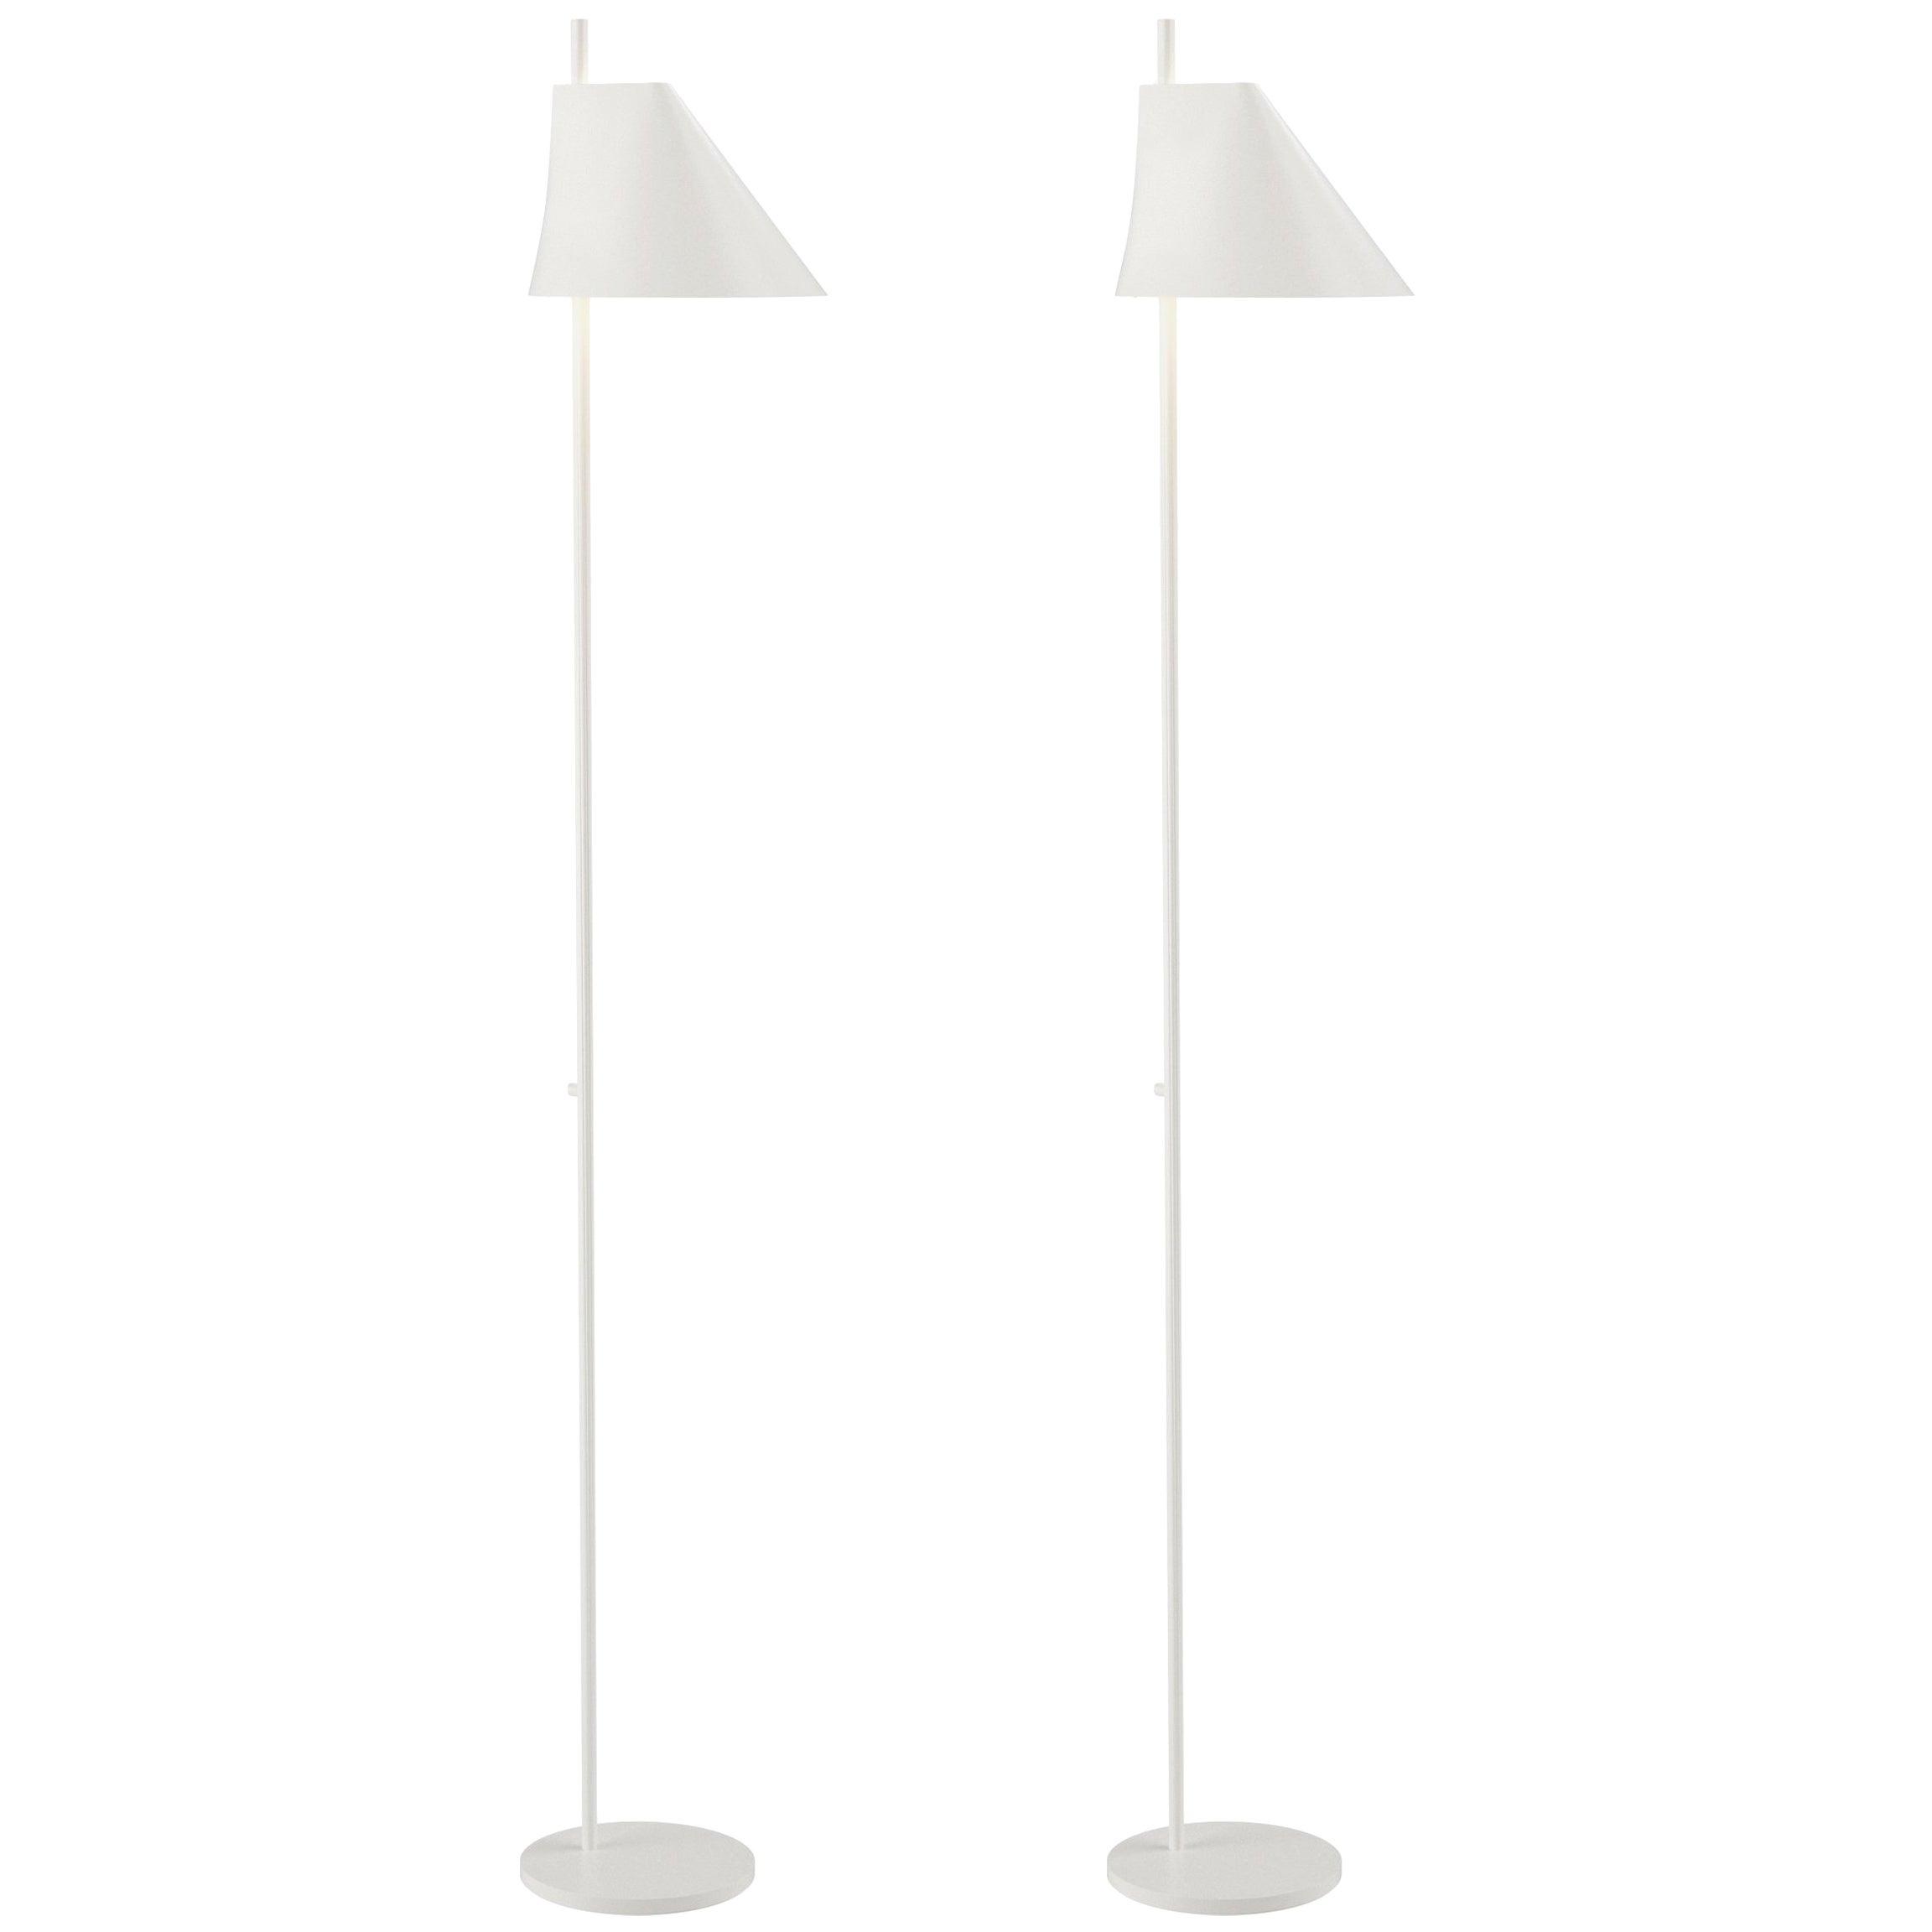 Gamfratesi White 'YUH' Floor Lamp for Louis Poulsen